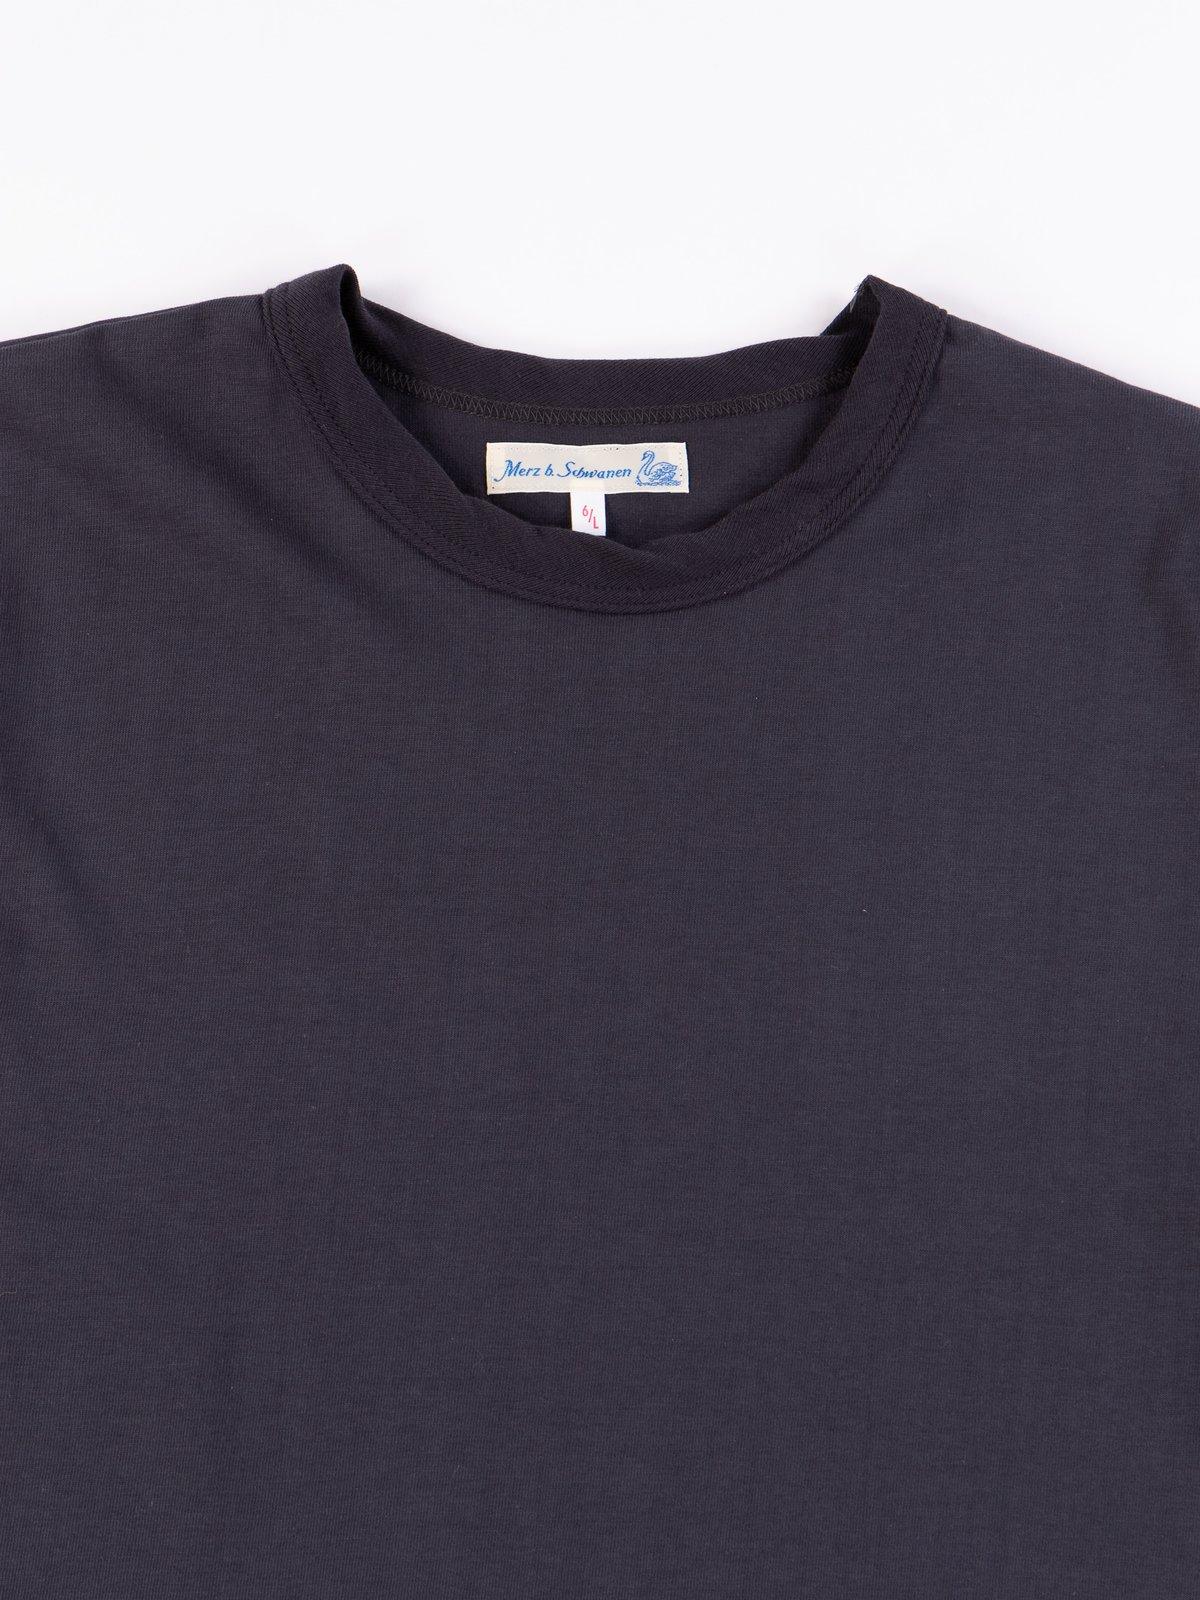 Slate 214 Organic Cotton Rundhals Shirt - Image 3